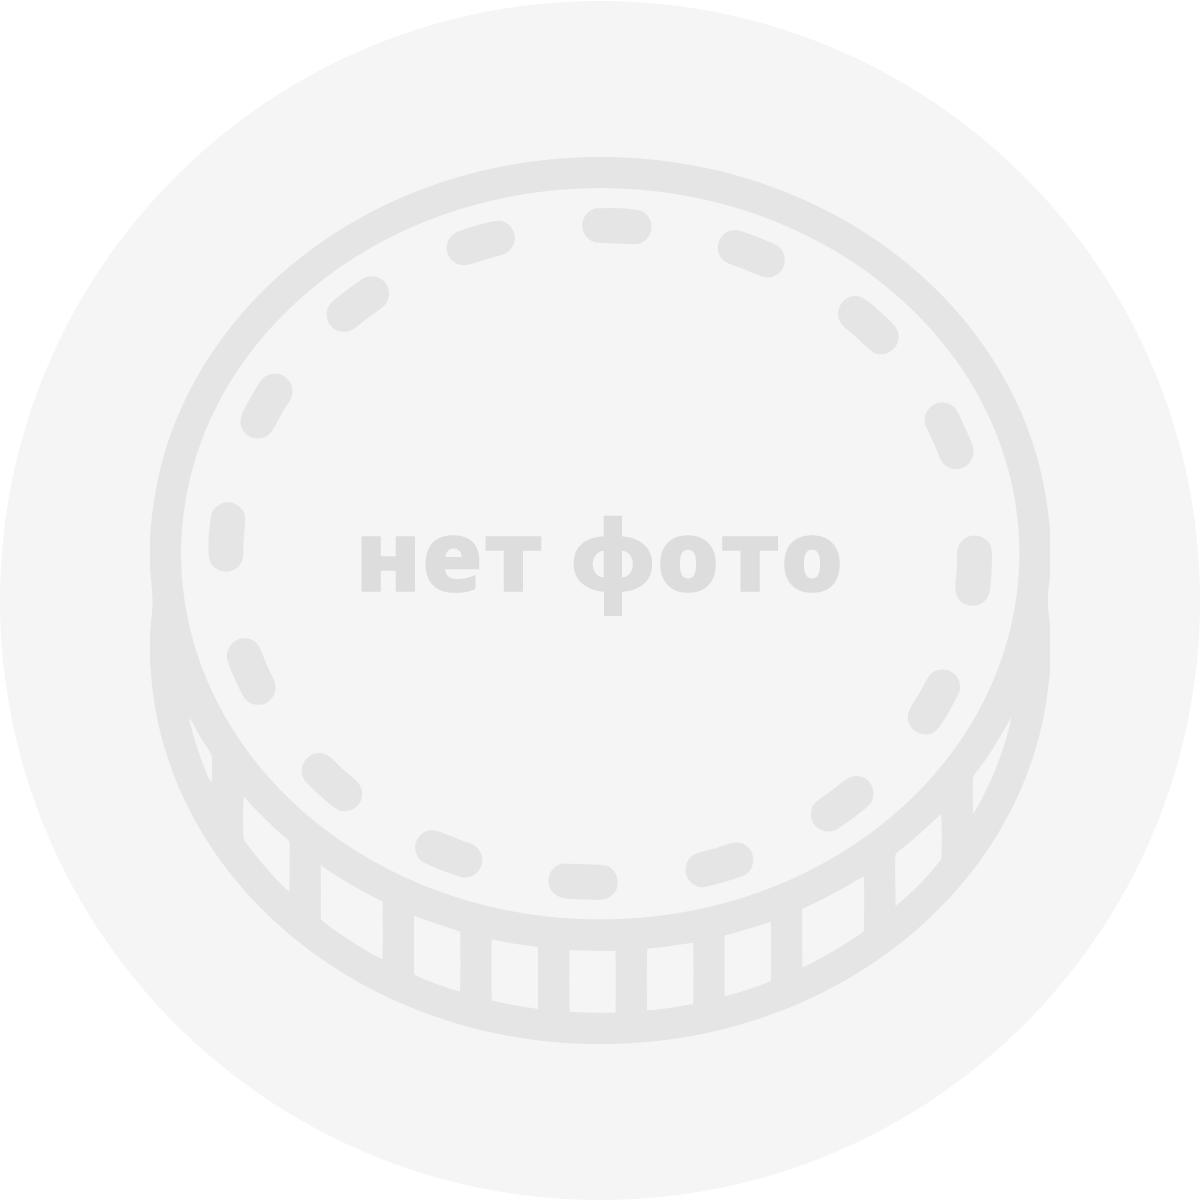 Лесото, 15 малоти (1979 г.)